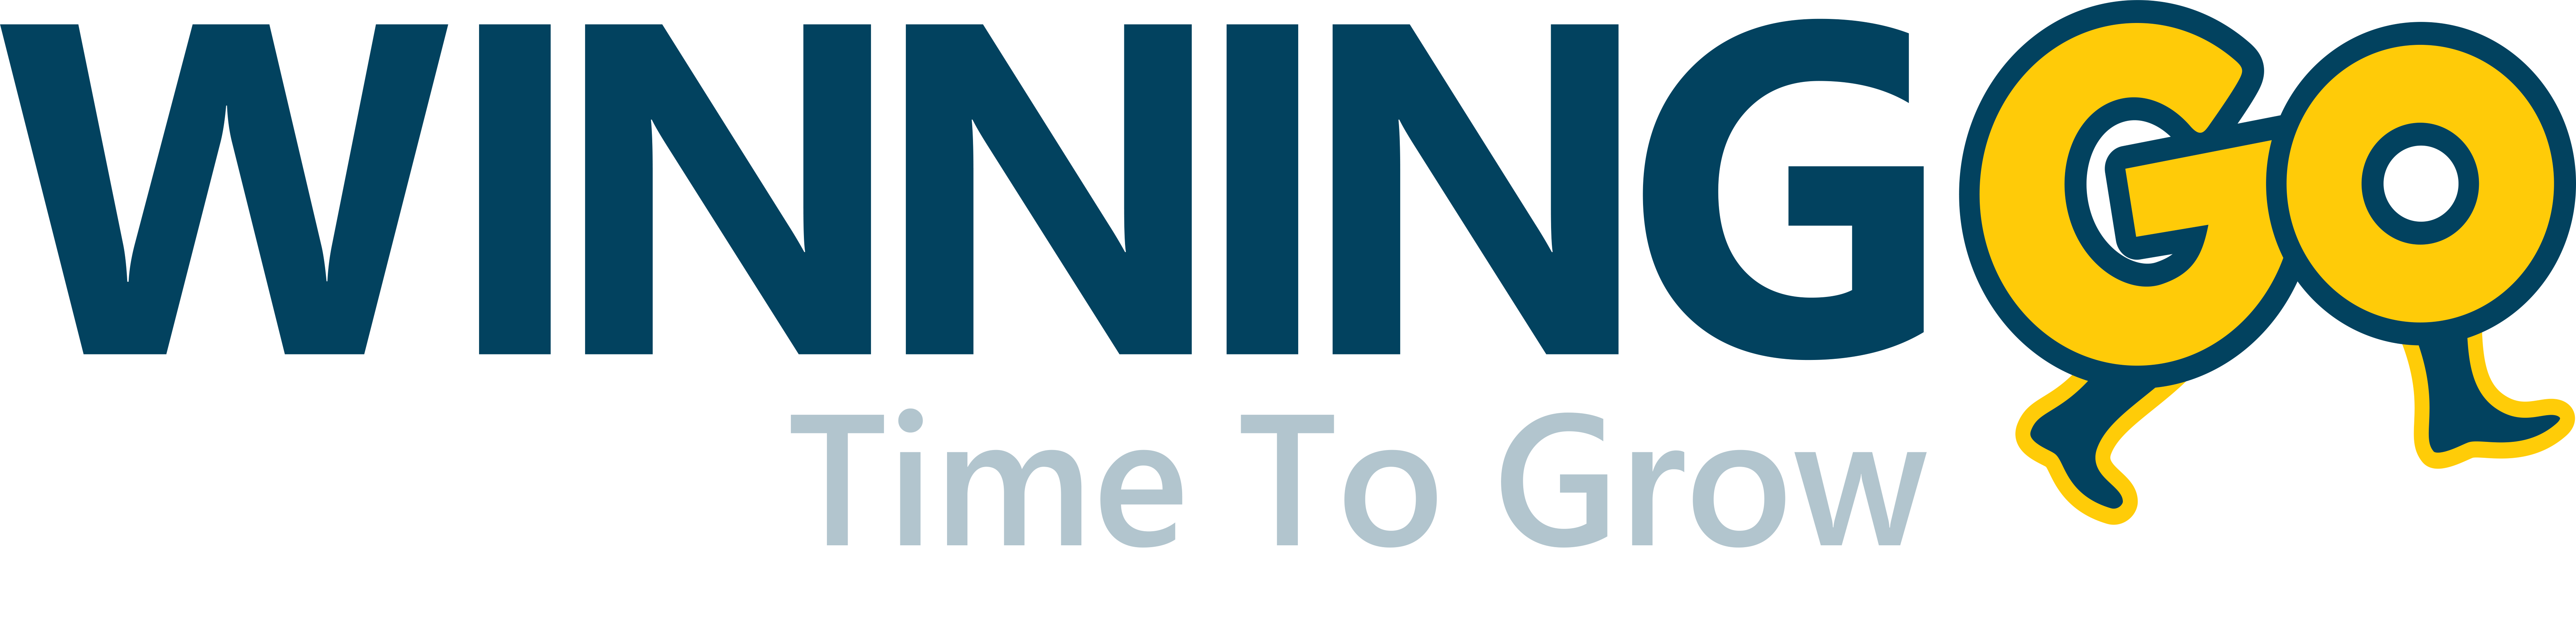 winninggo logo-png